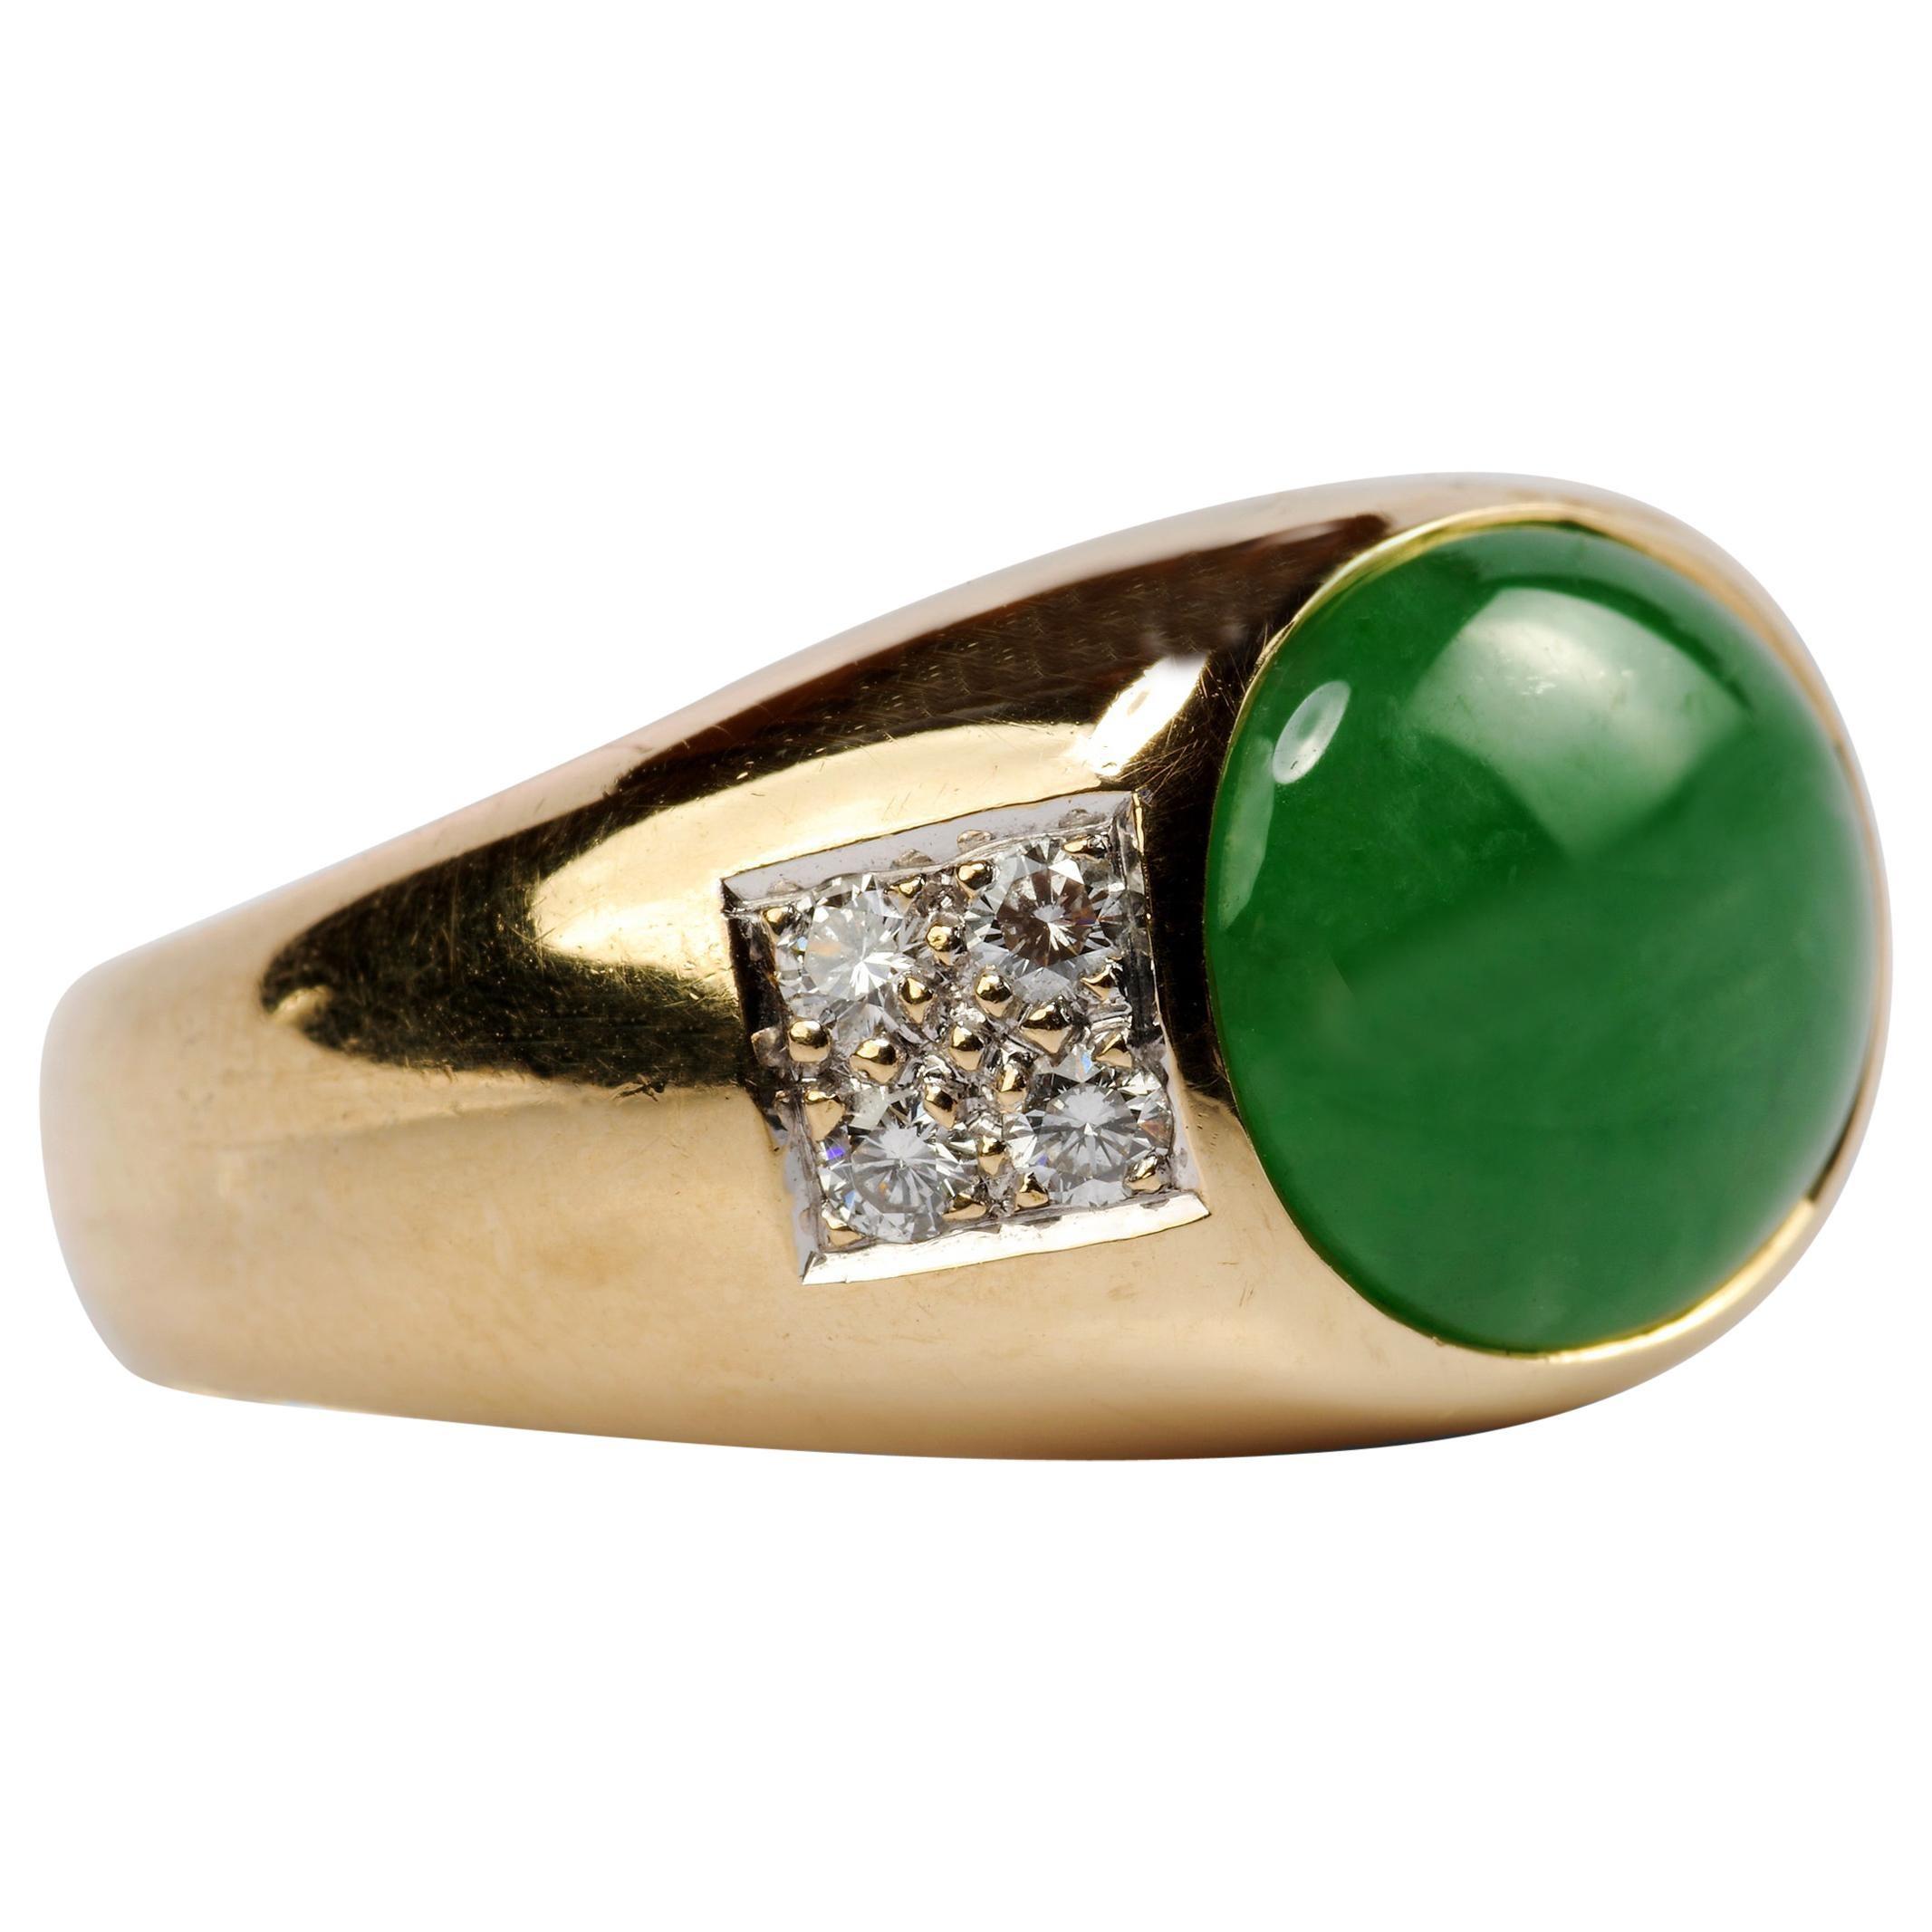 Jade and Diamond Ring circa 1980s Certified Untreated